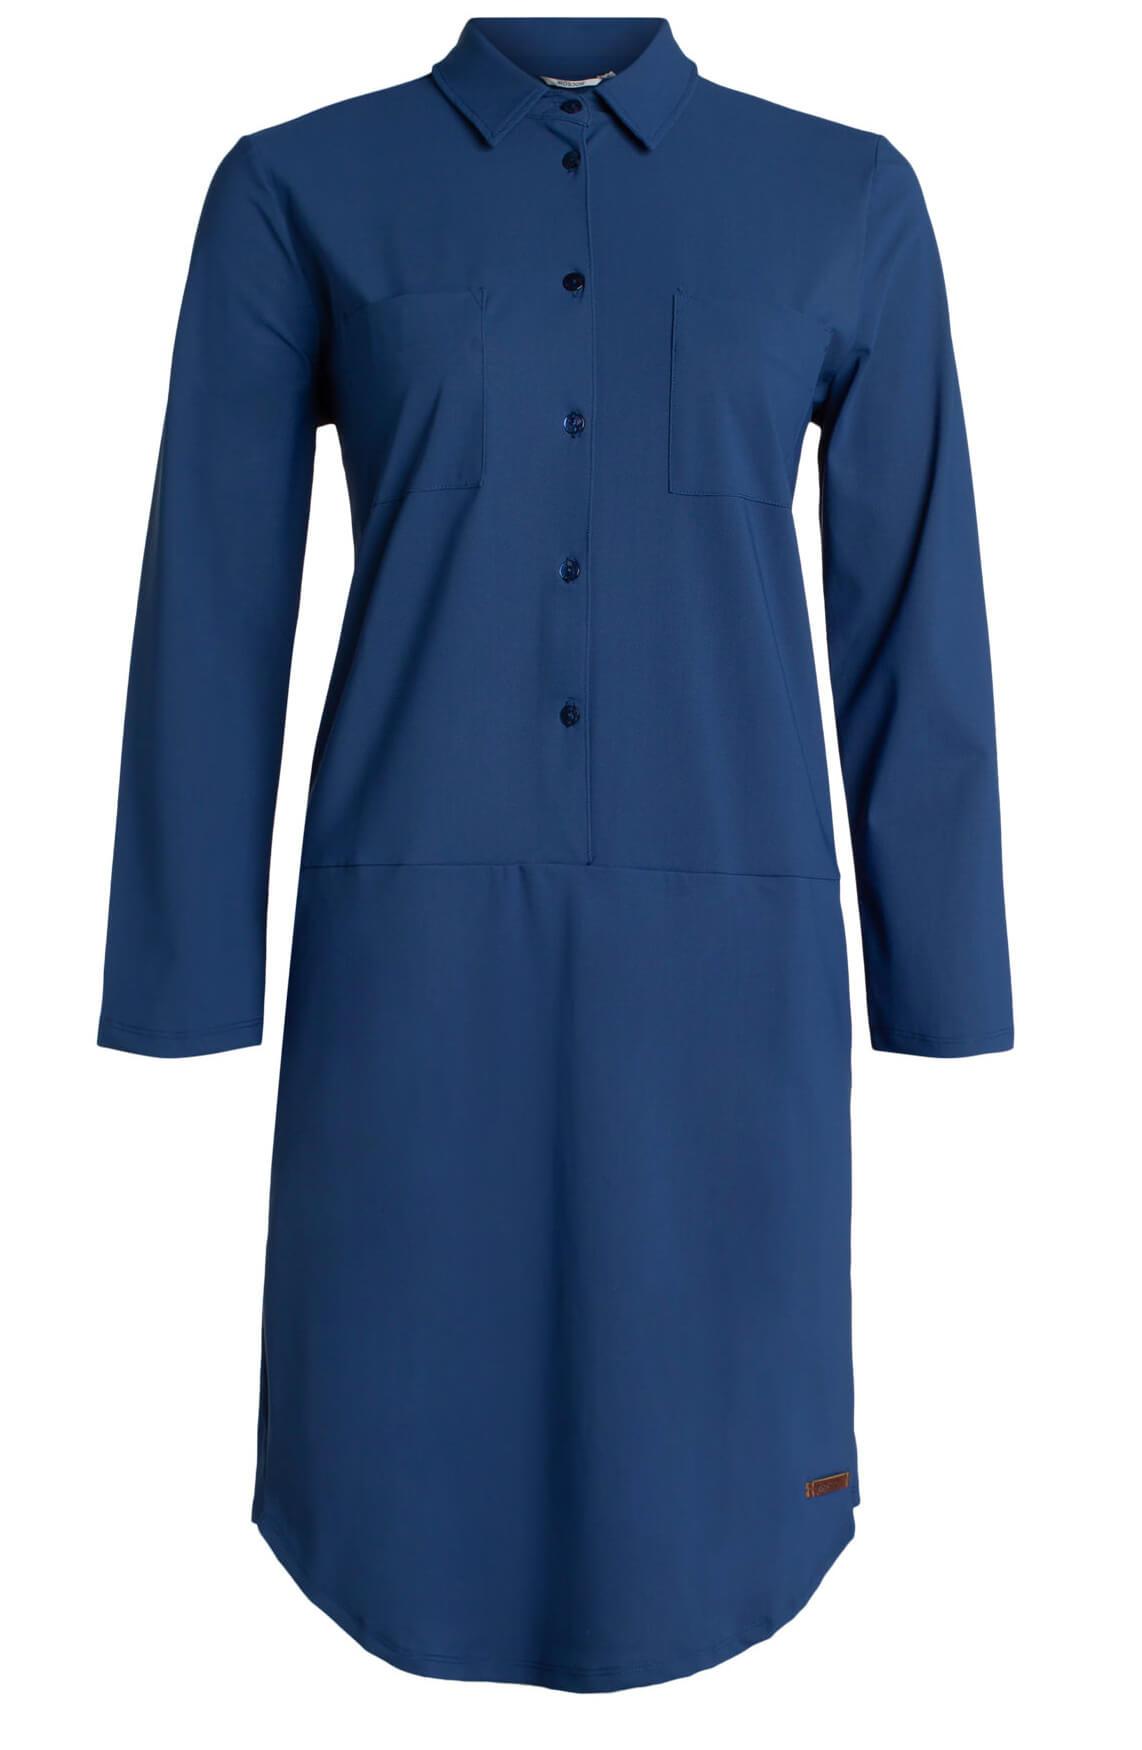 Moscow Dames Comfortabele jurk Blauw